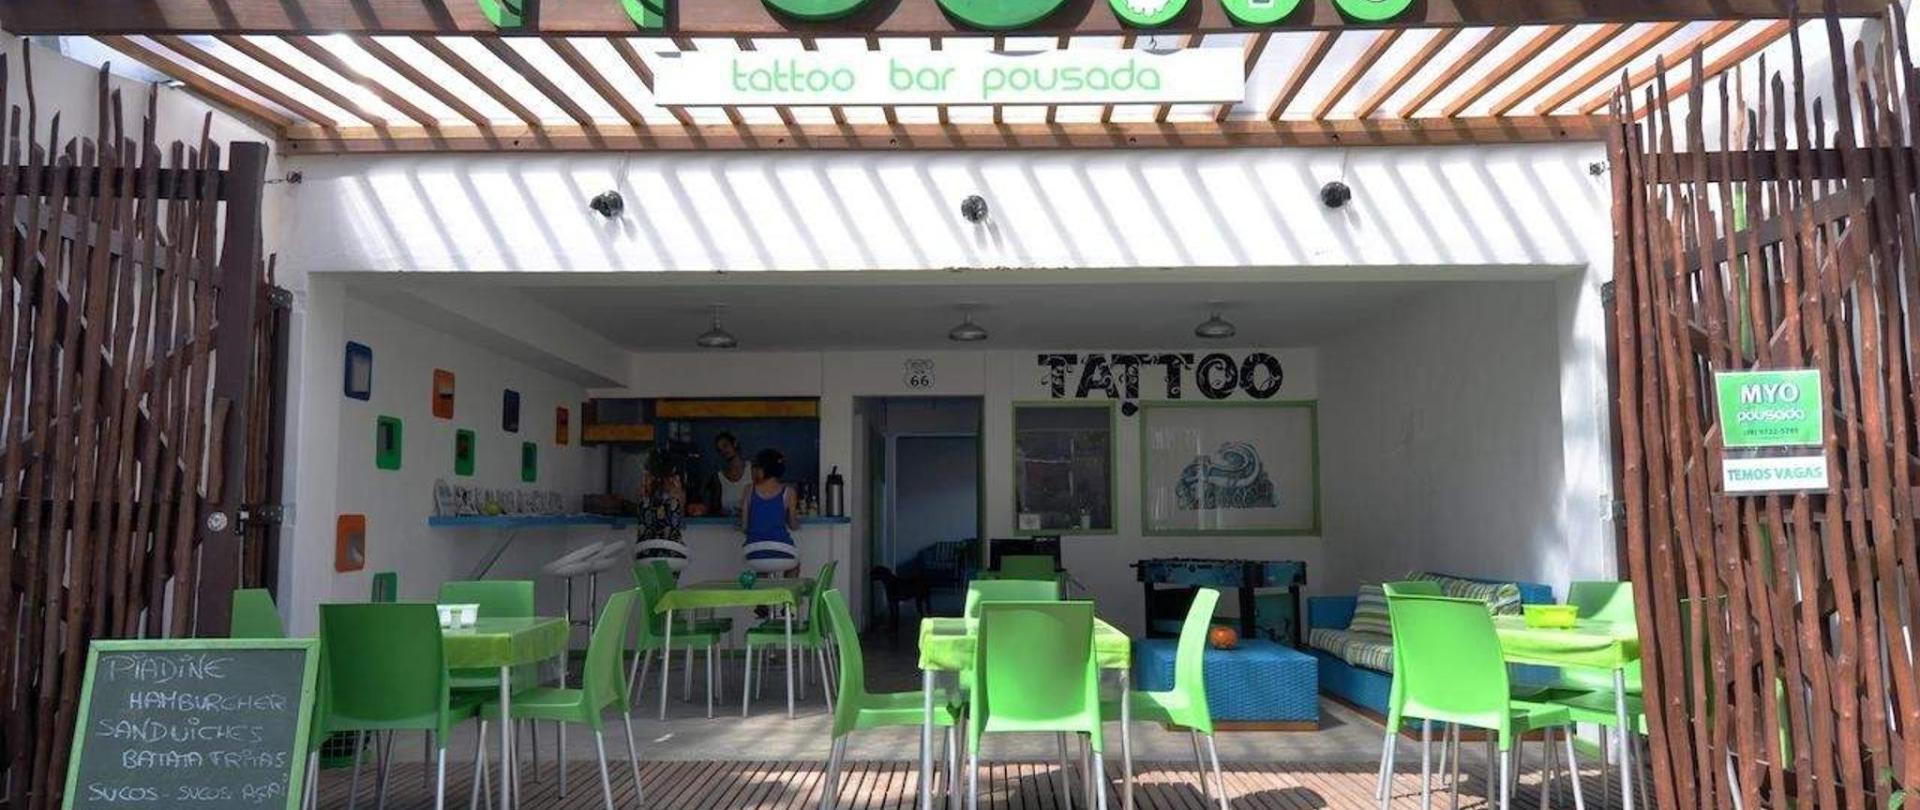 Myo Tattoo Bar Pousada | Jericoacoara | Ceará | Brazil.jpg